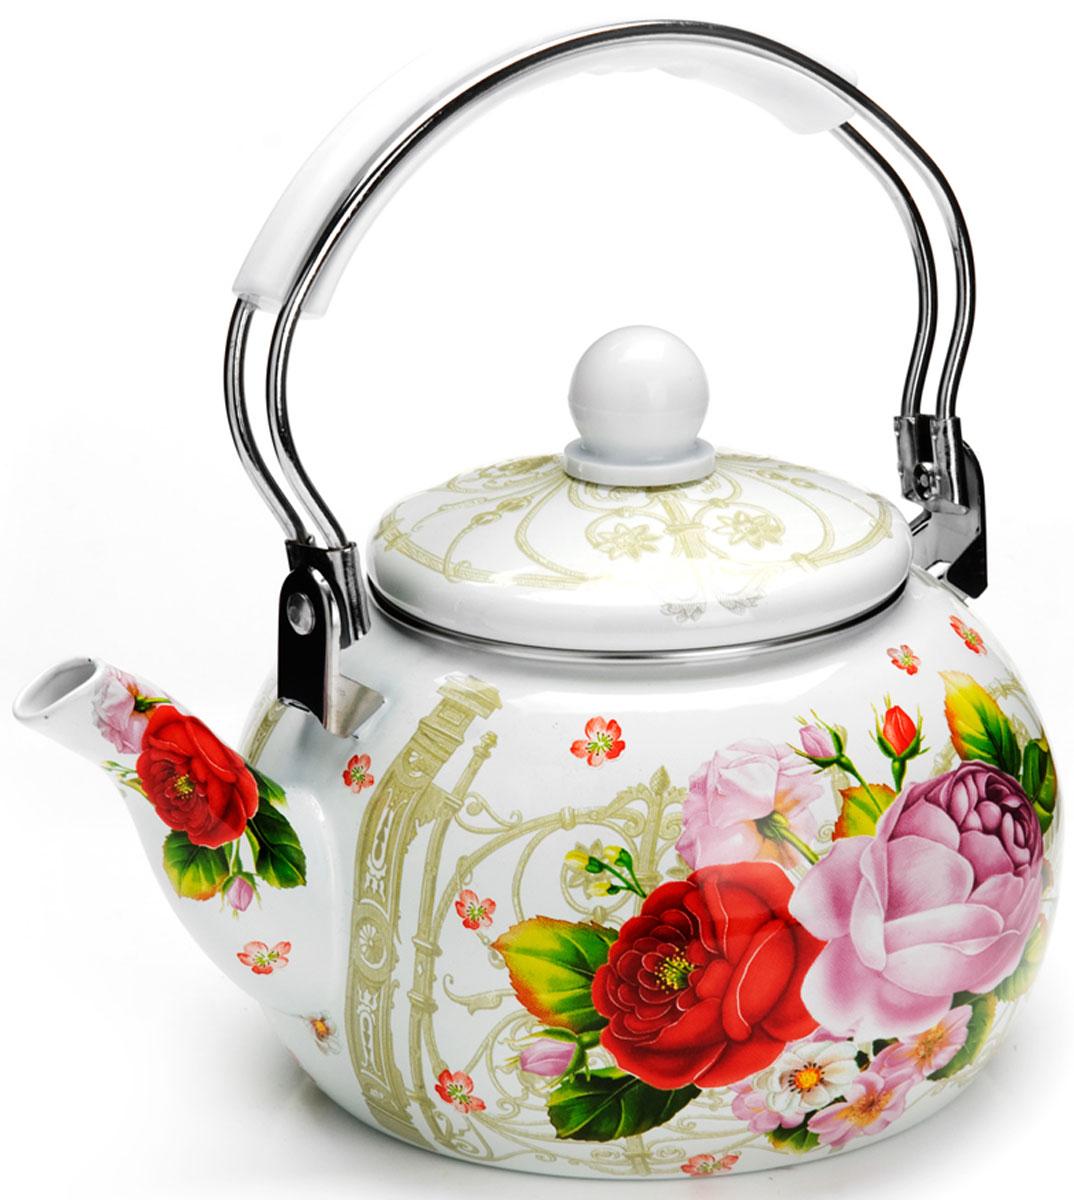 Чайник Mayer & Boch Цветы, 2,5 л. 2649426494